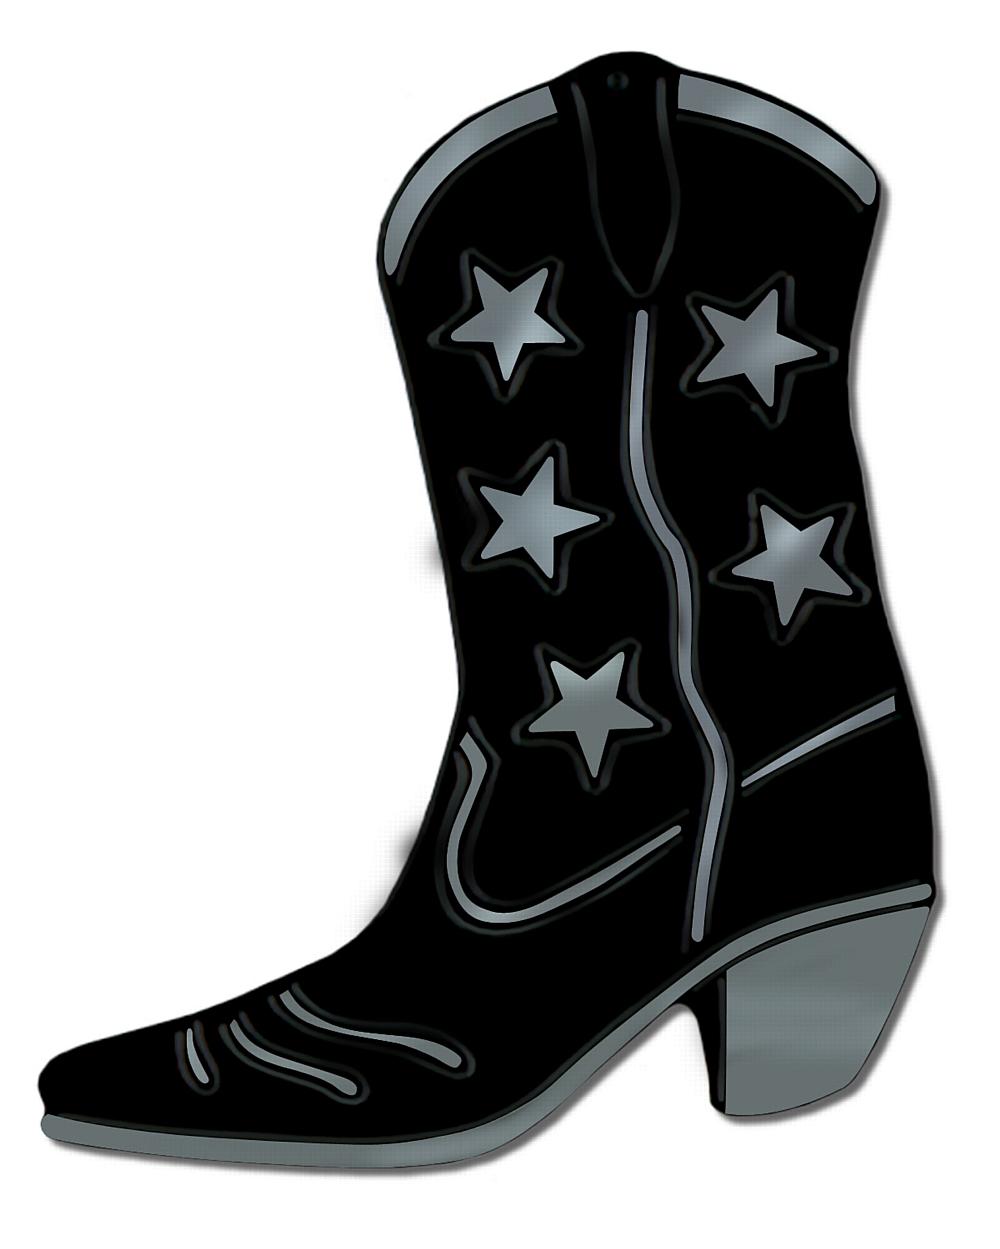 Cowboy boot boot silhouette clip art at vector clip art.